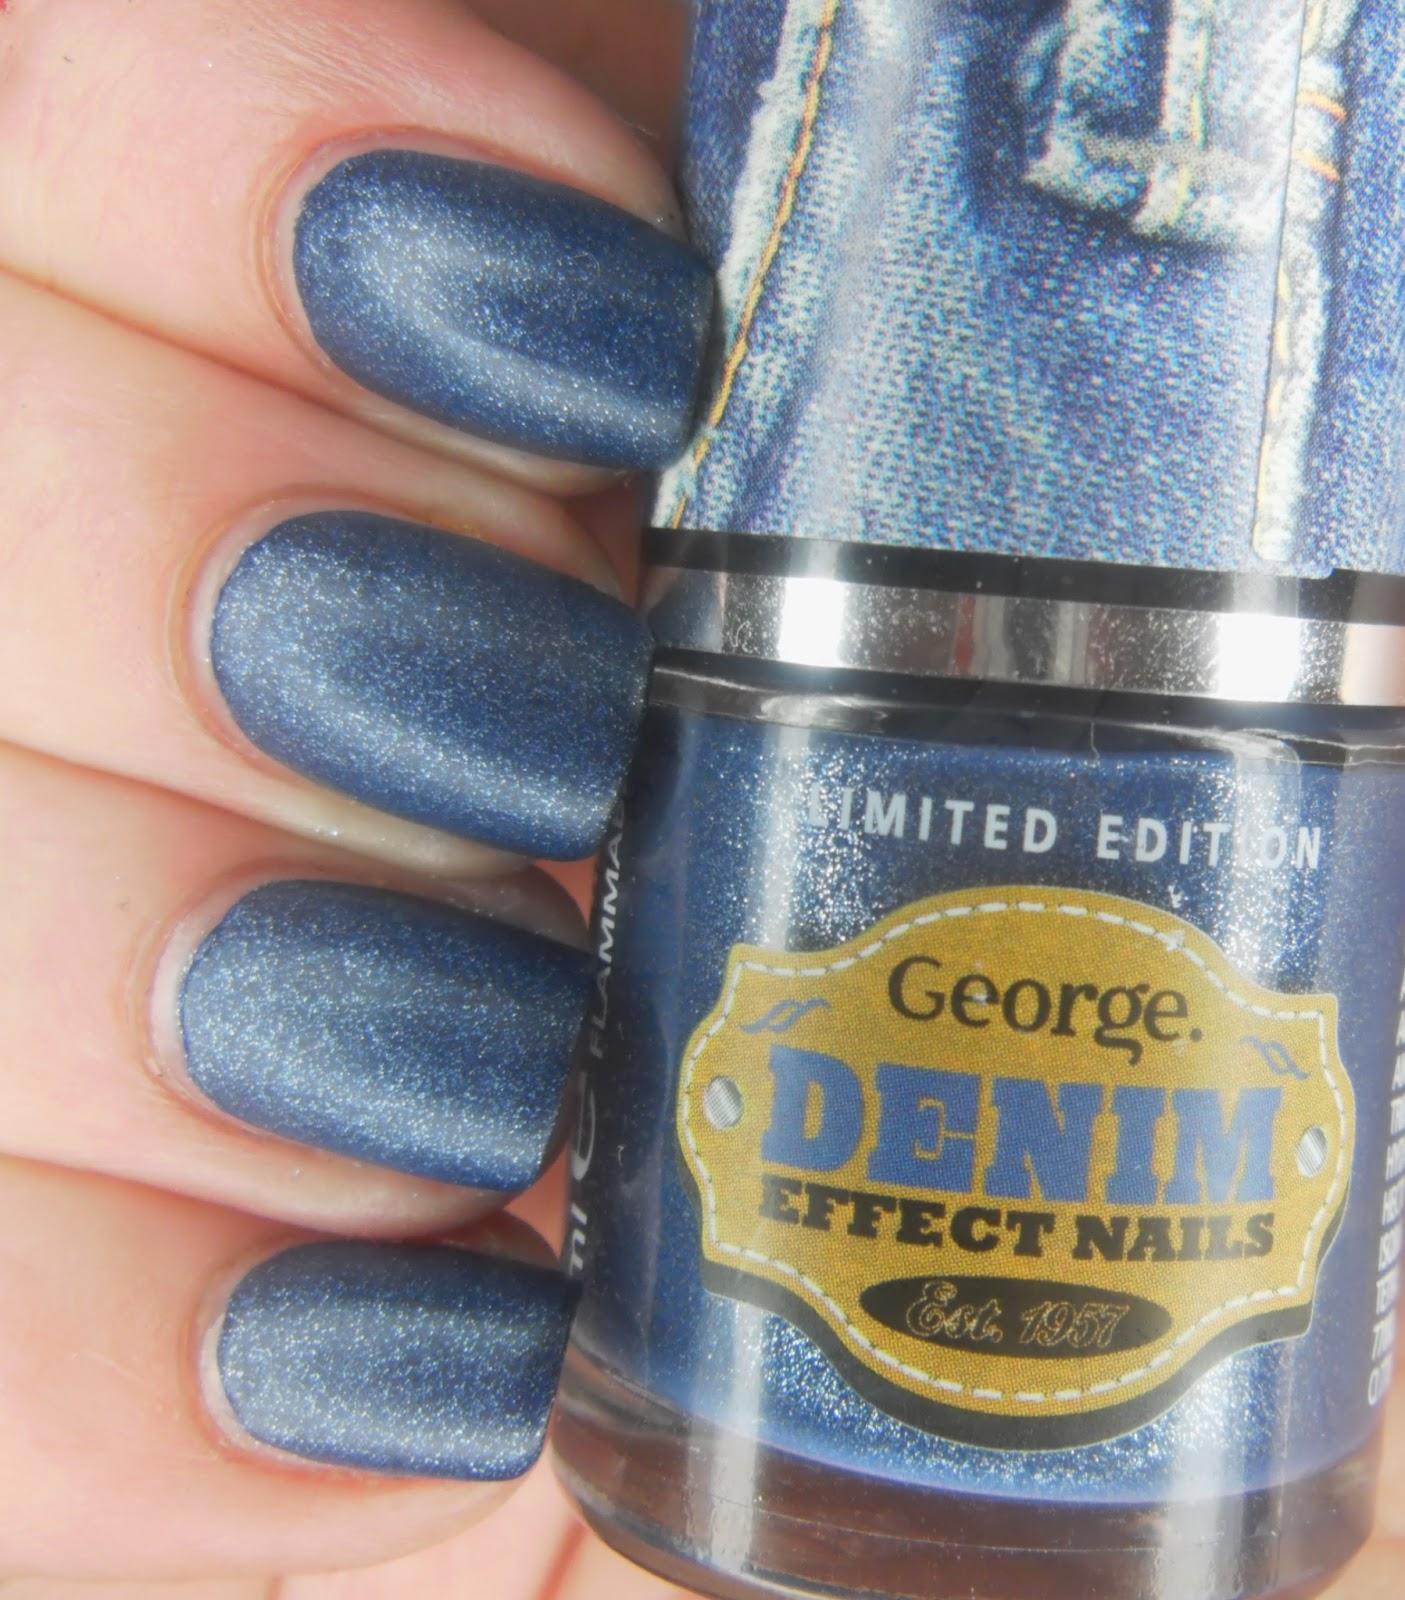 SpecialGirl Nails: Denim Effect Nail Polish...From Asda?